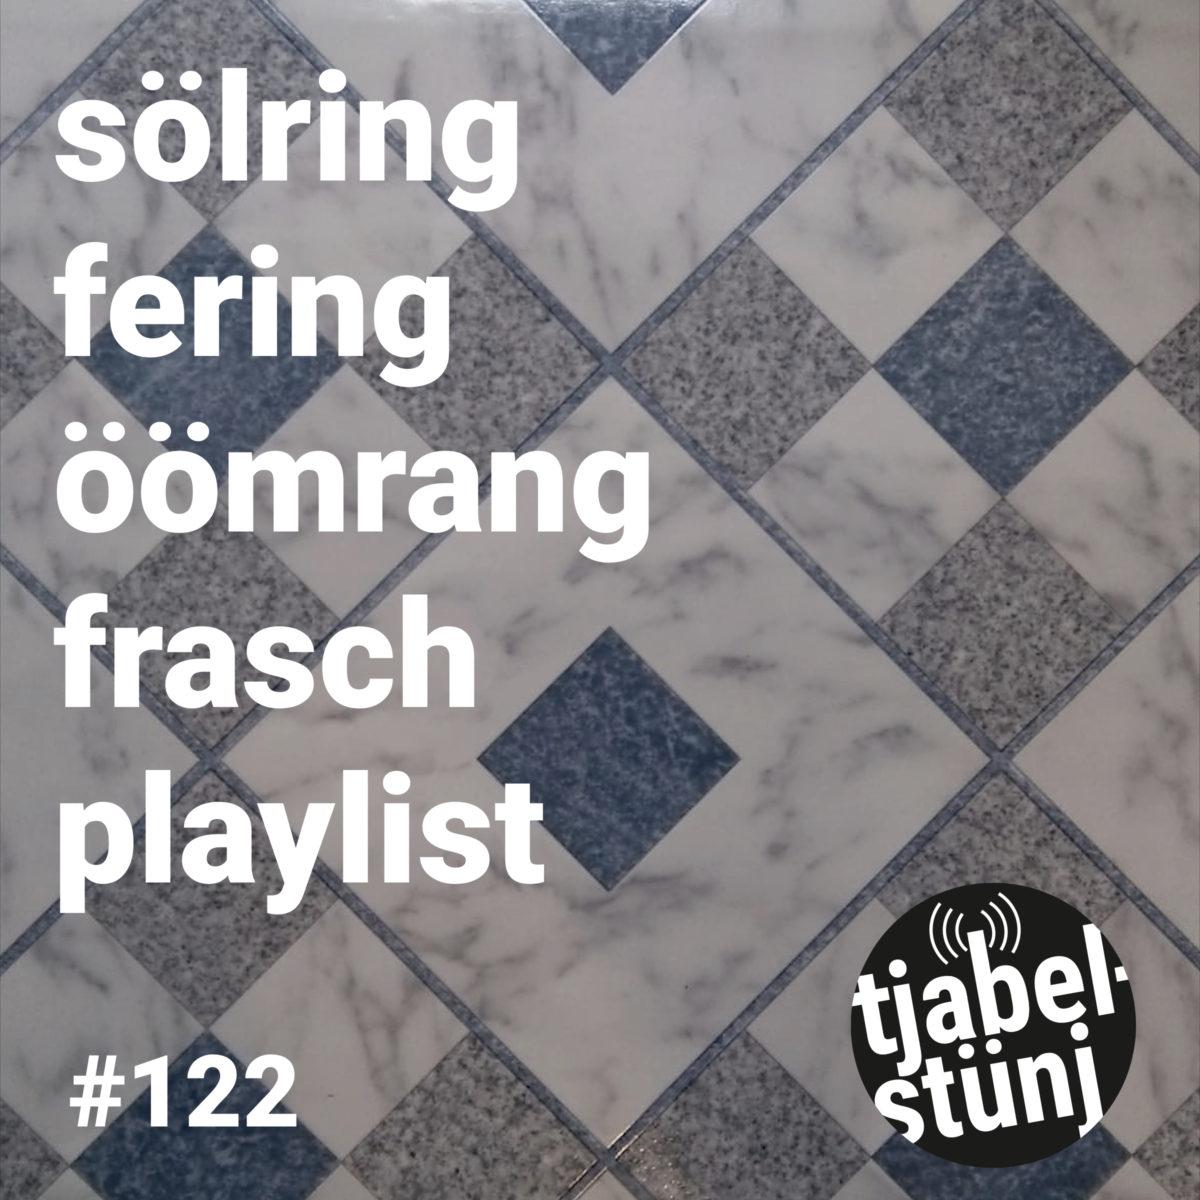 Playlist #122